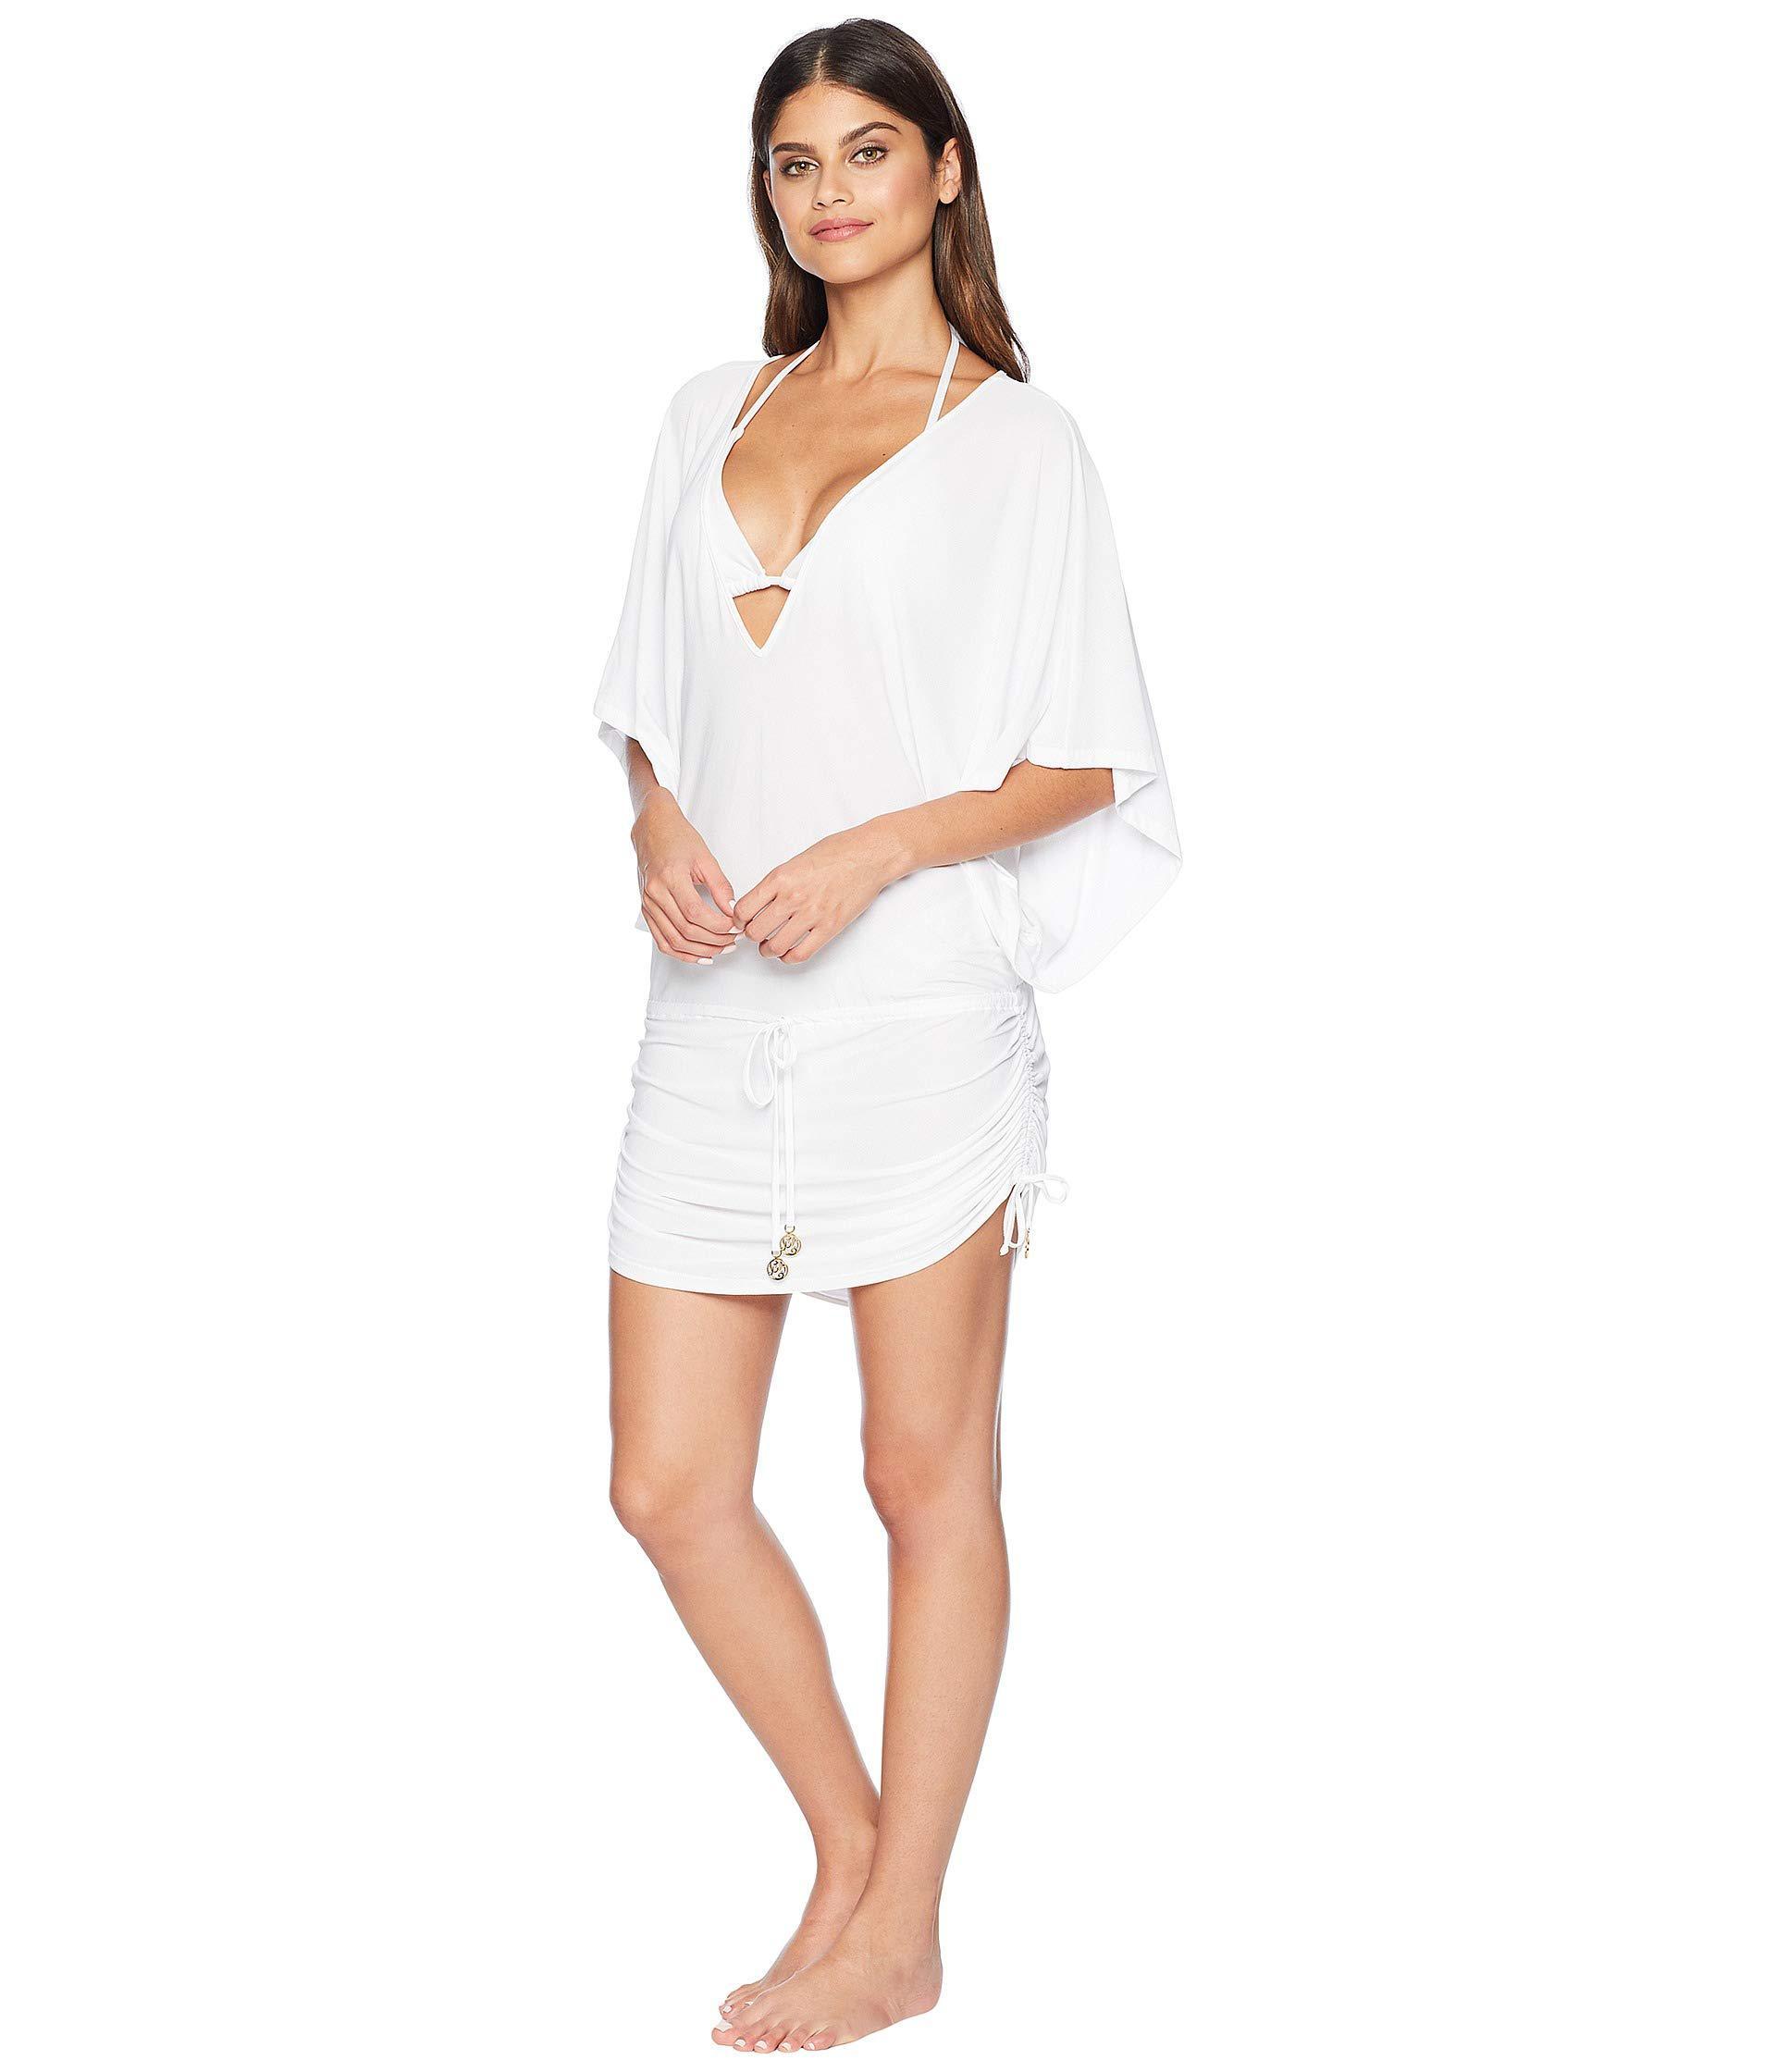 55ce951d5a Lyst - Luli Fama Cosita Buena Cabana V-neck Dress Cover-up (black) Women's  Swimwear in White